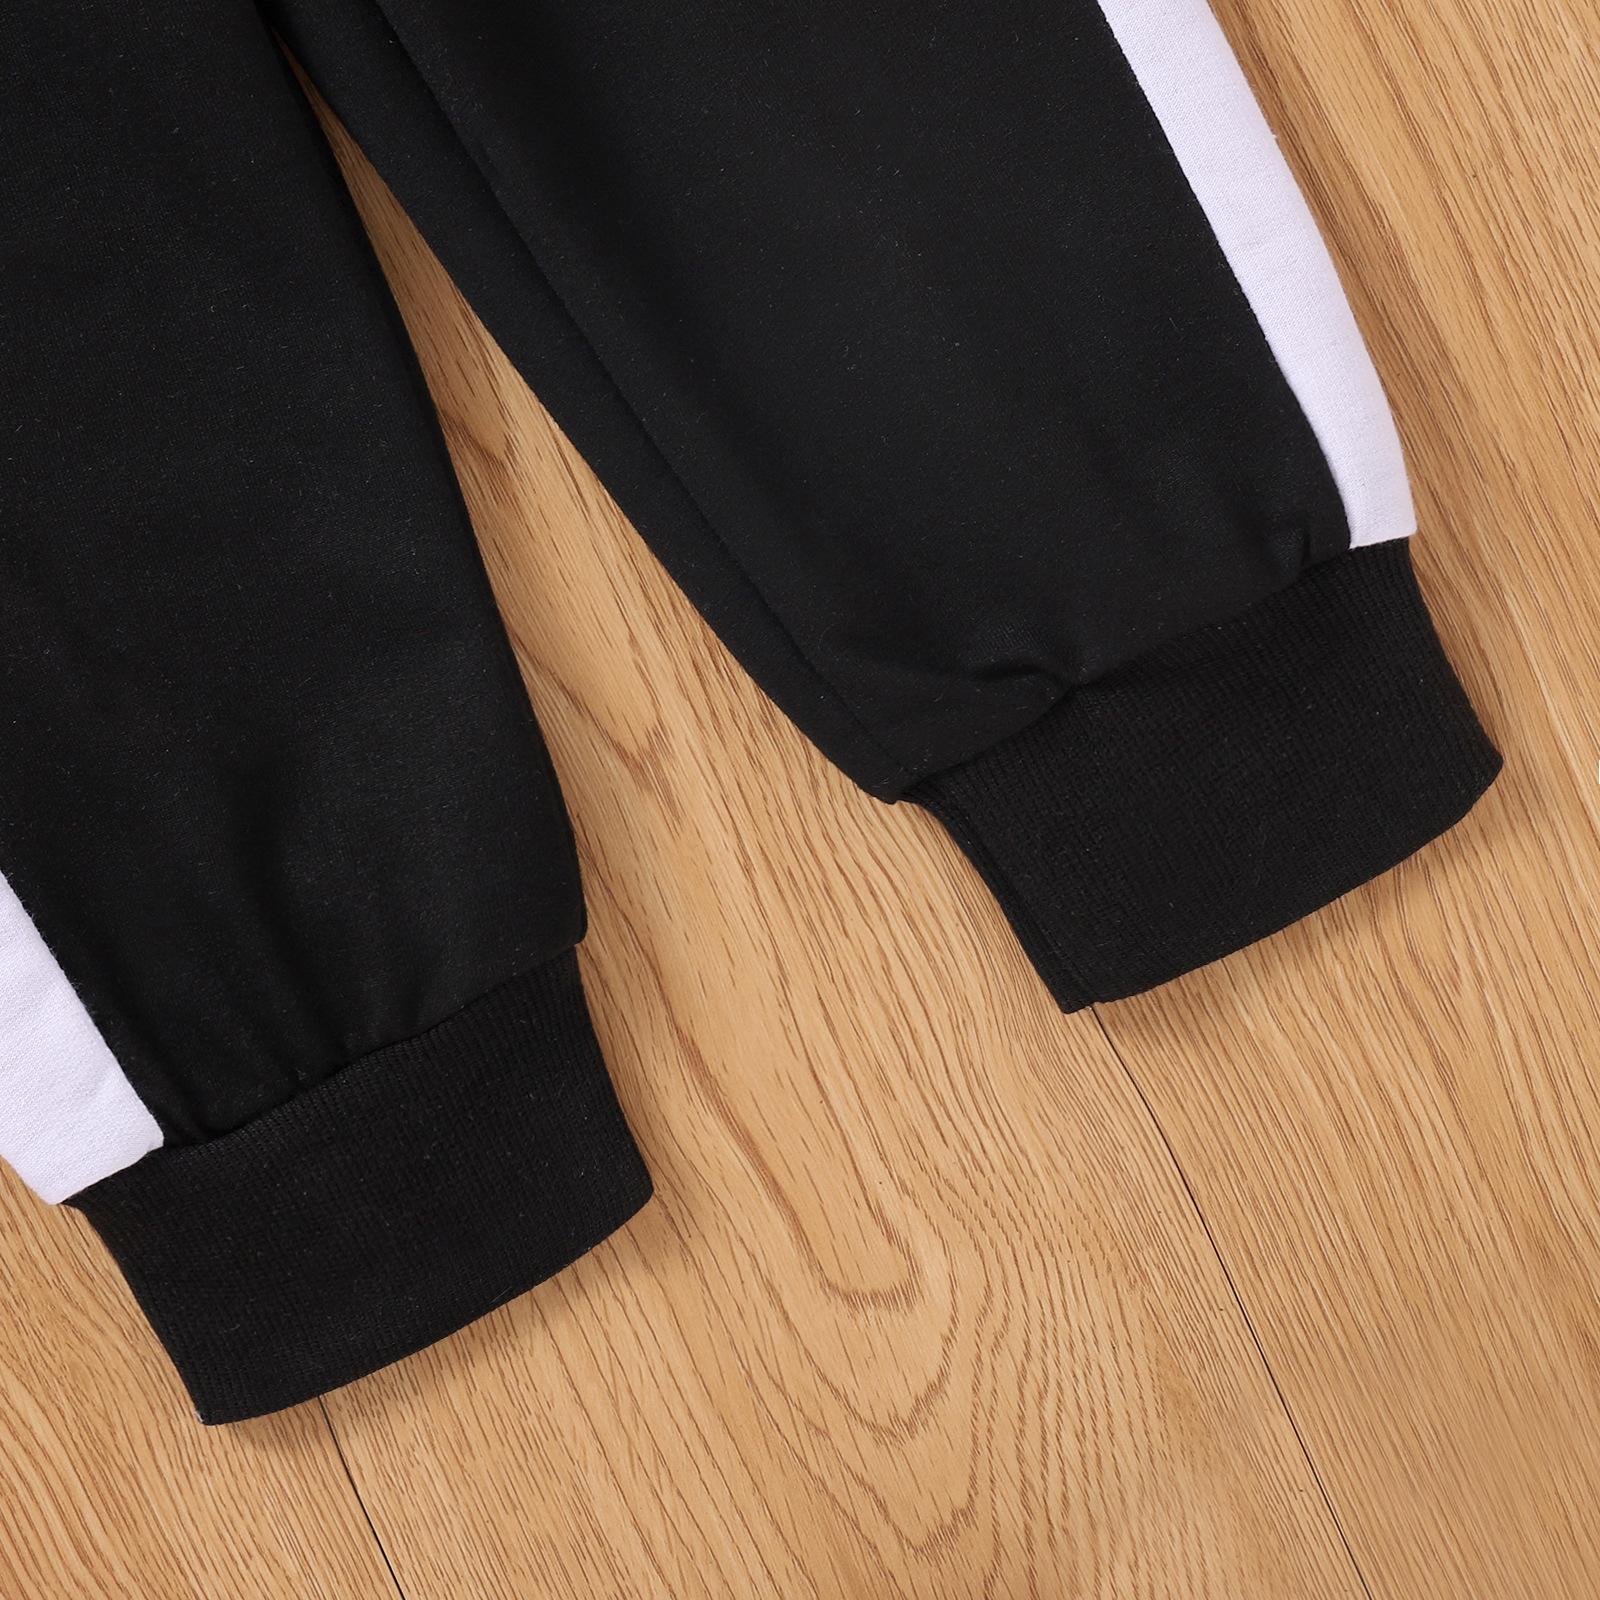 LW COTTON Boy  Material Series Striped Pants Set